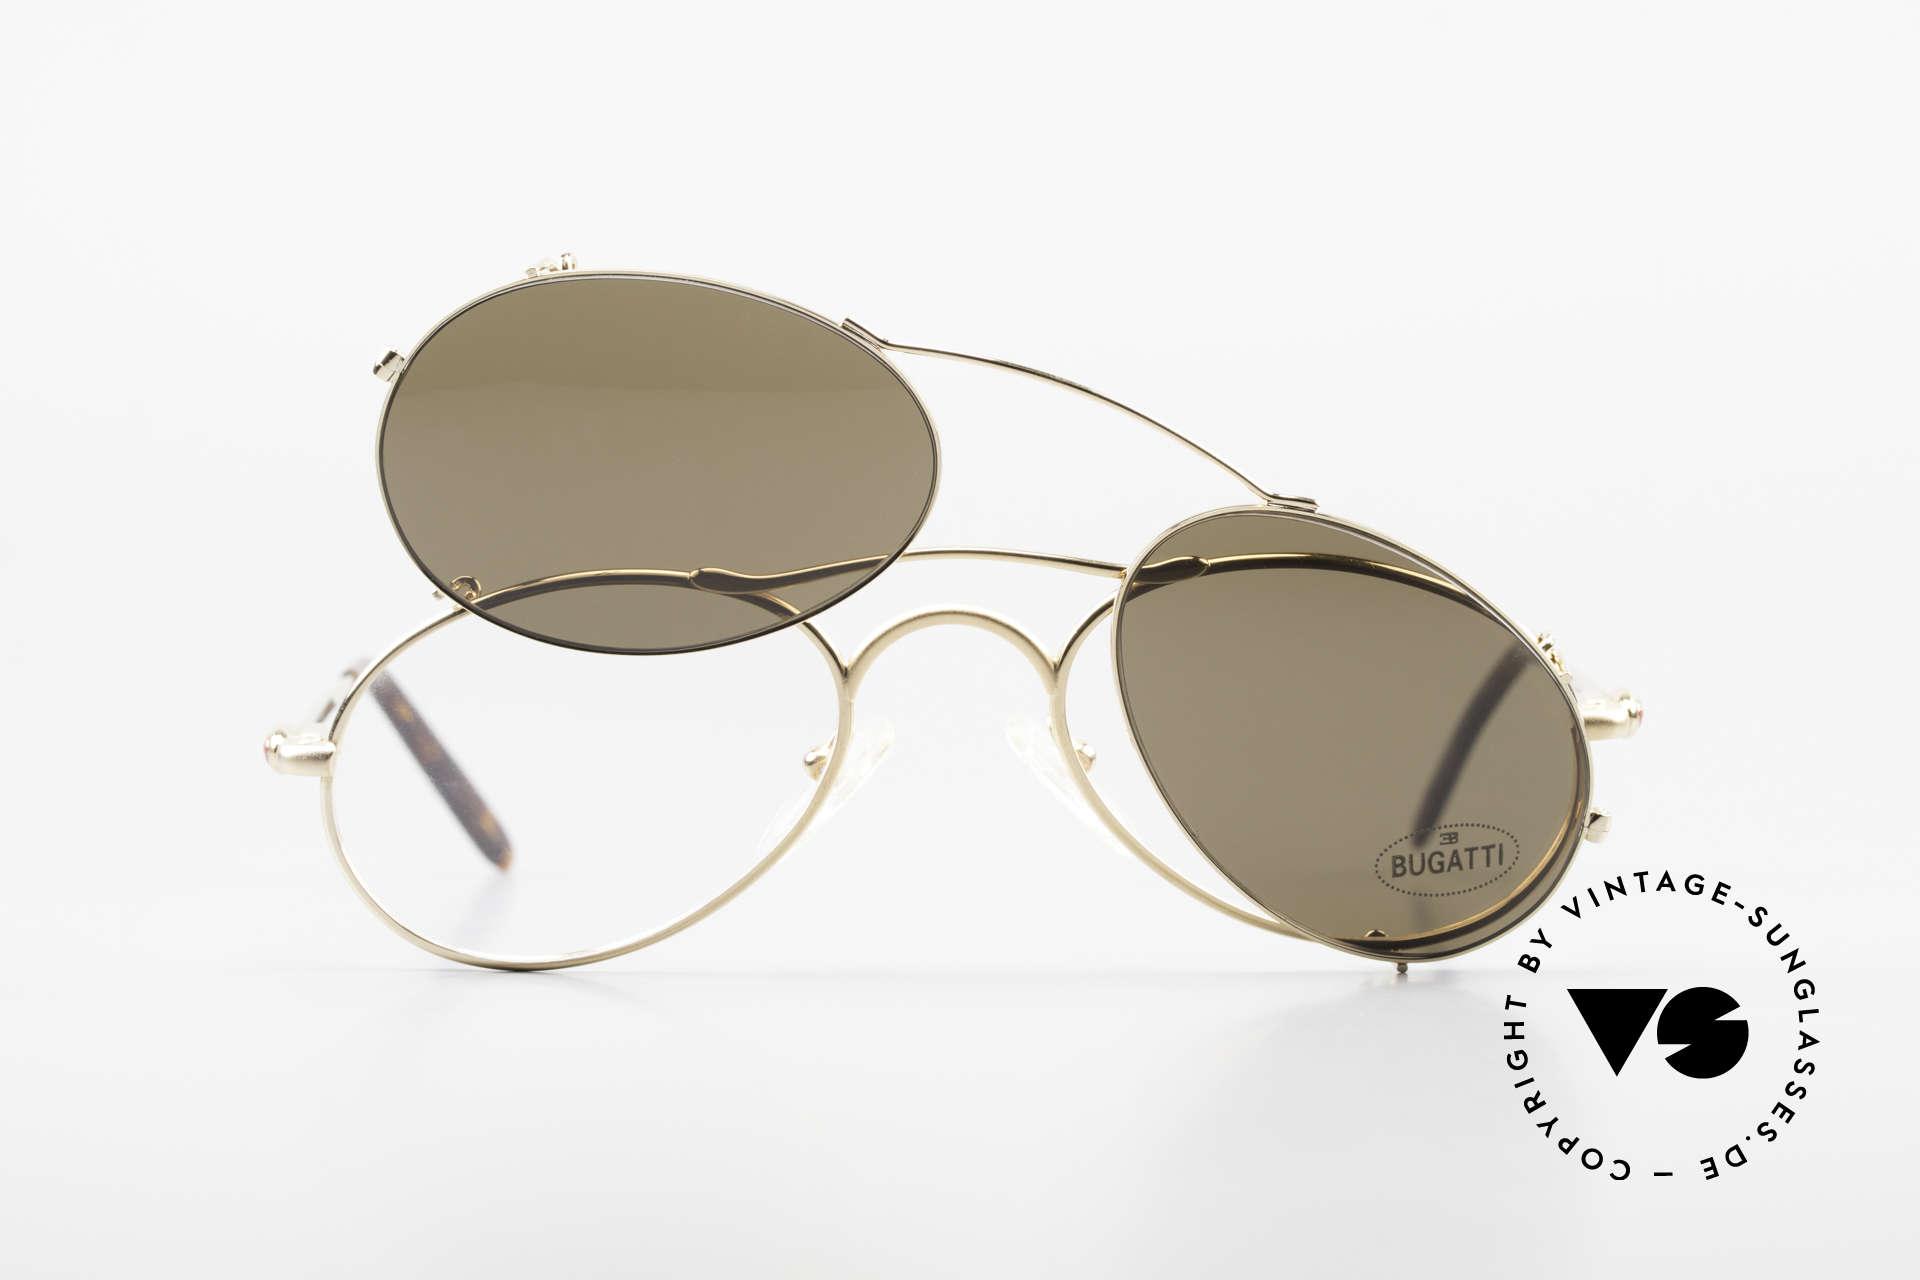 Bugatti 23407 Men's Eyeglasses With Clip On, NO RETRO glasses, but an old 90's original; vertu, Made for Men